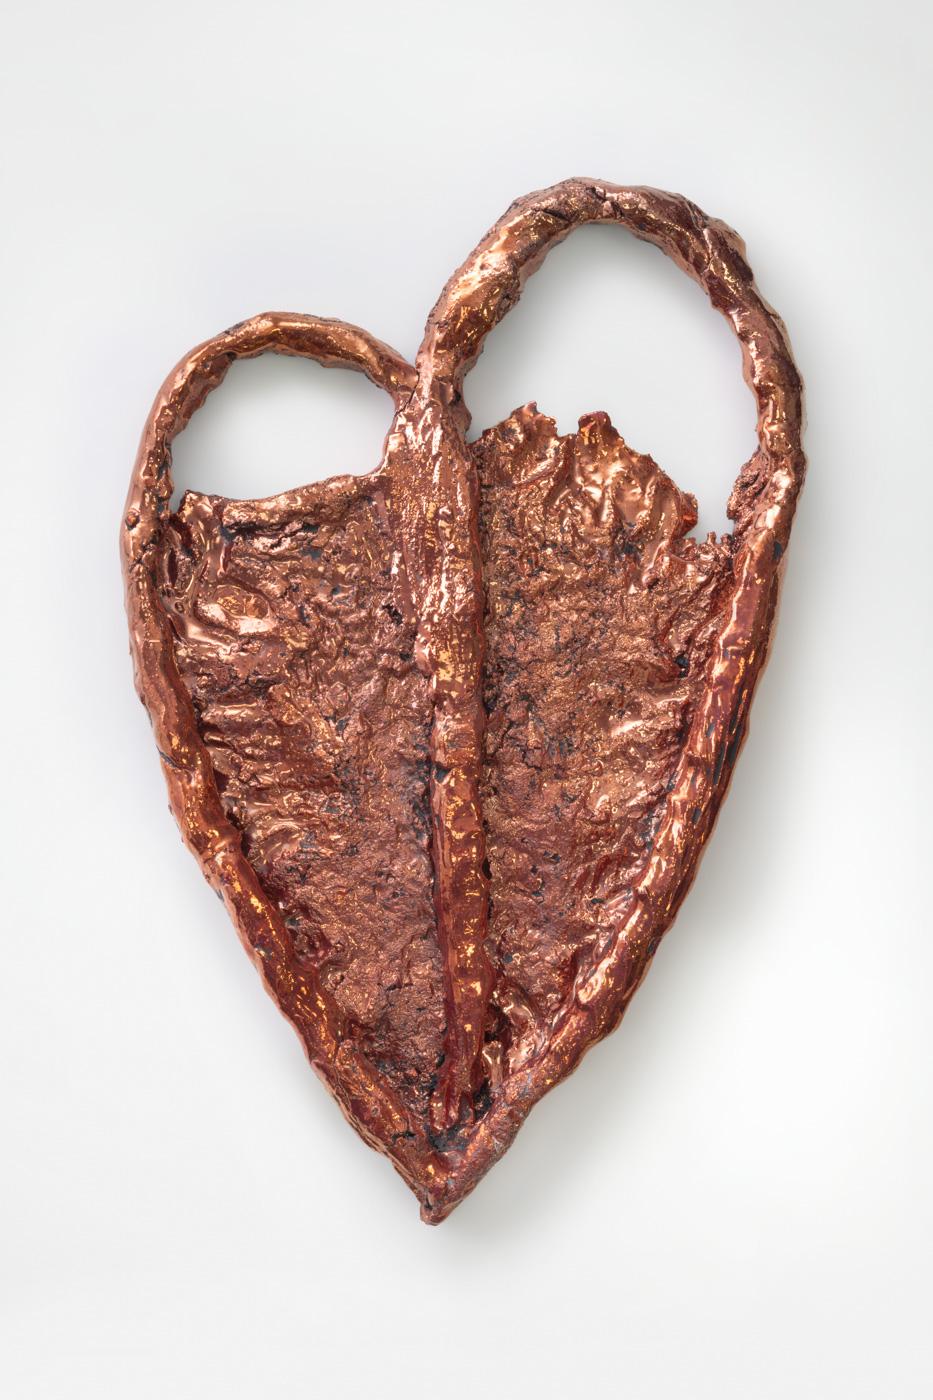 HEART (6835), 2018